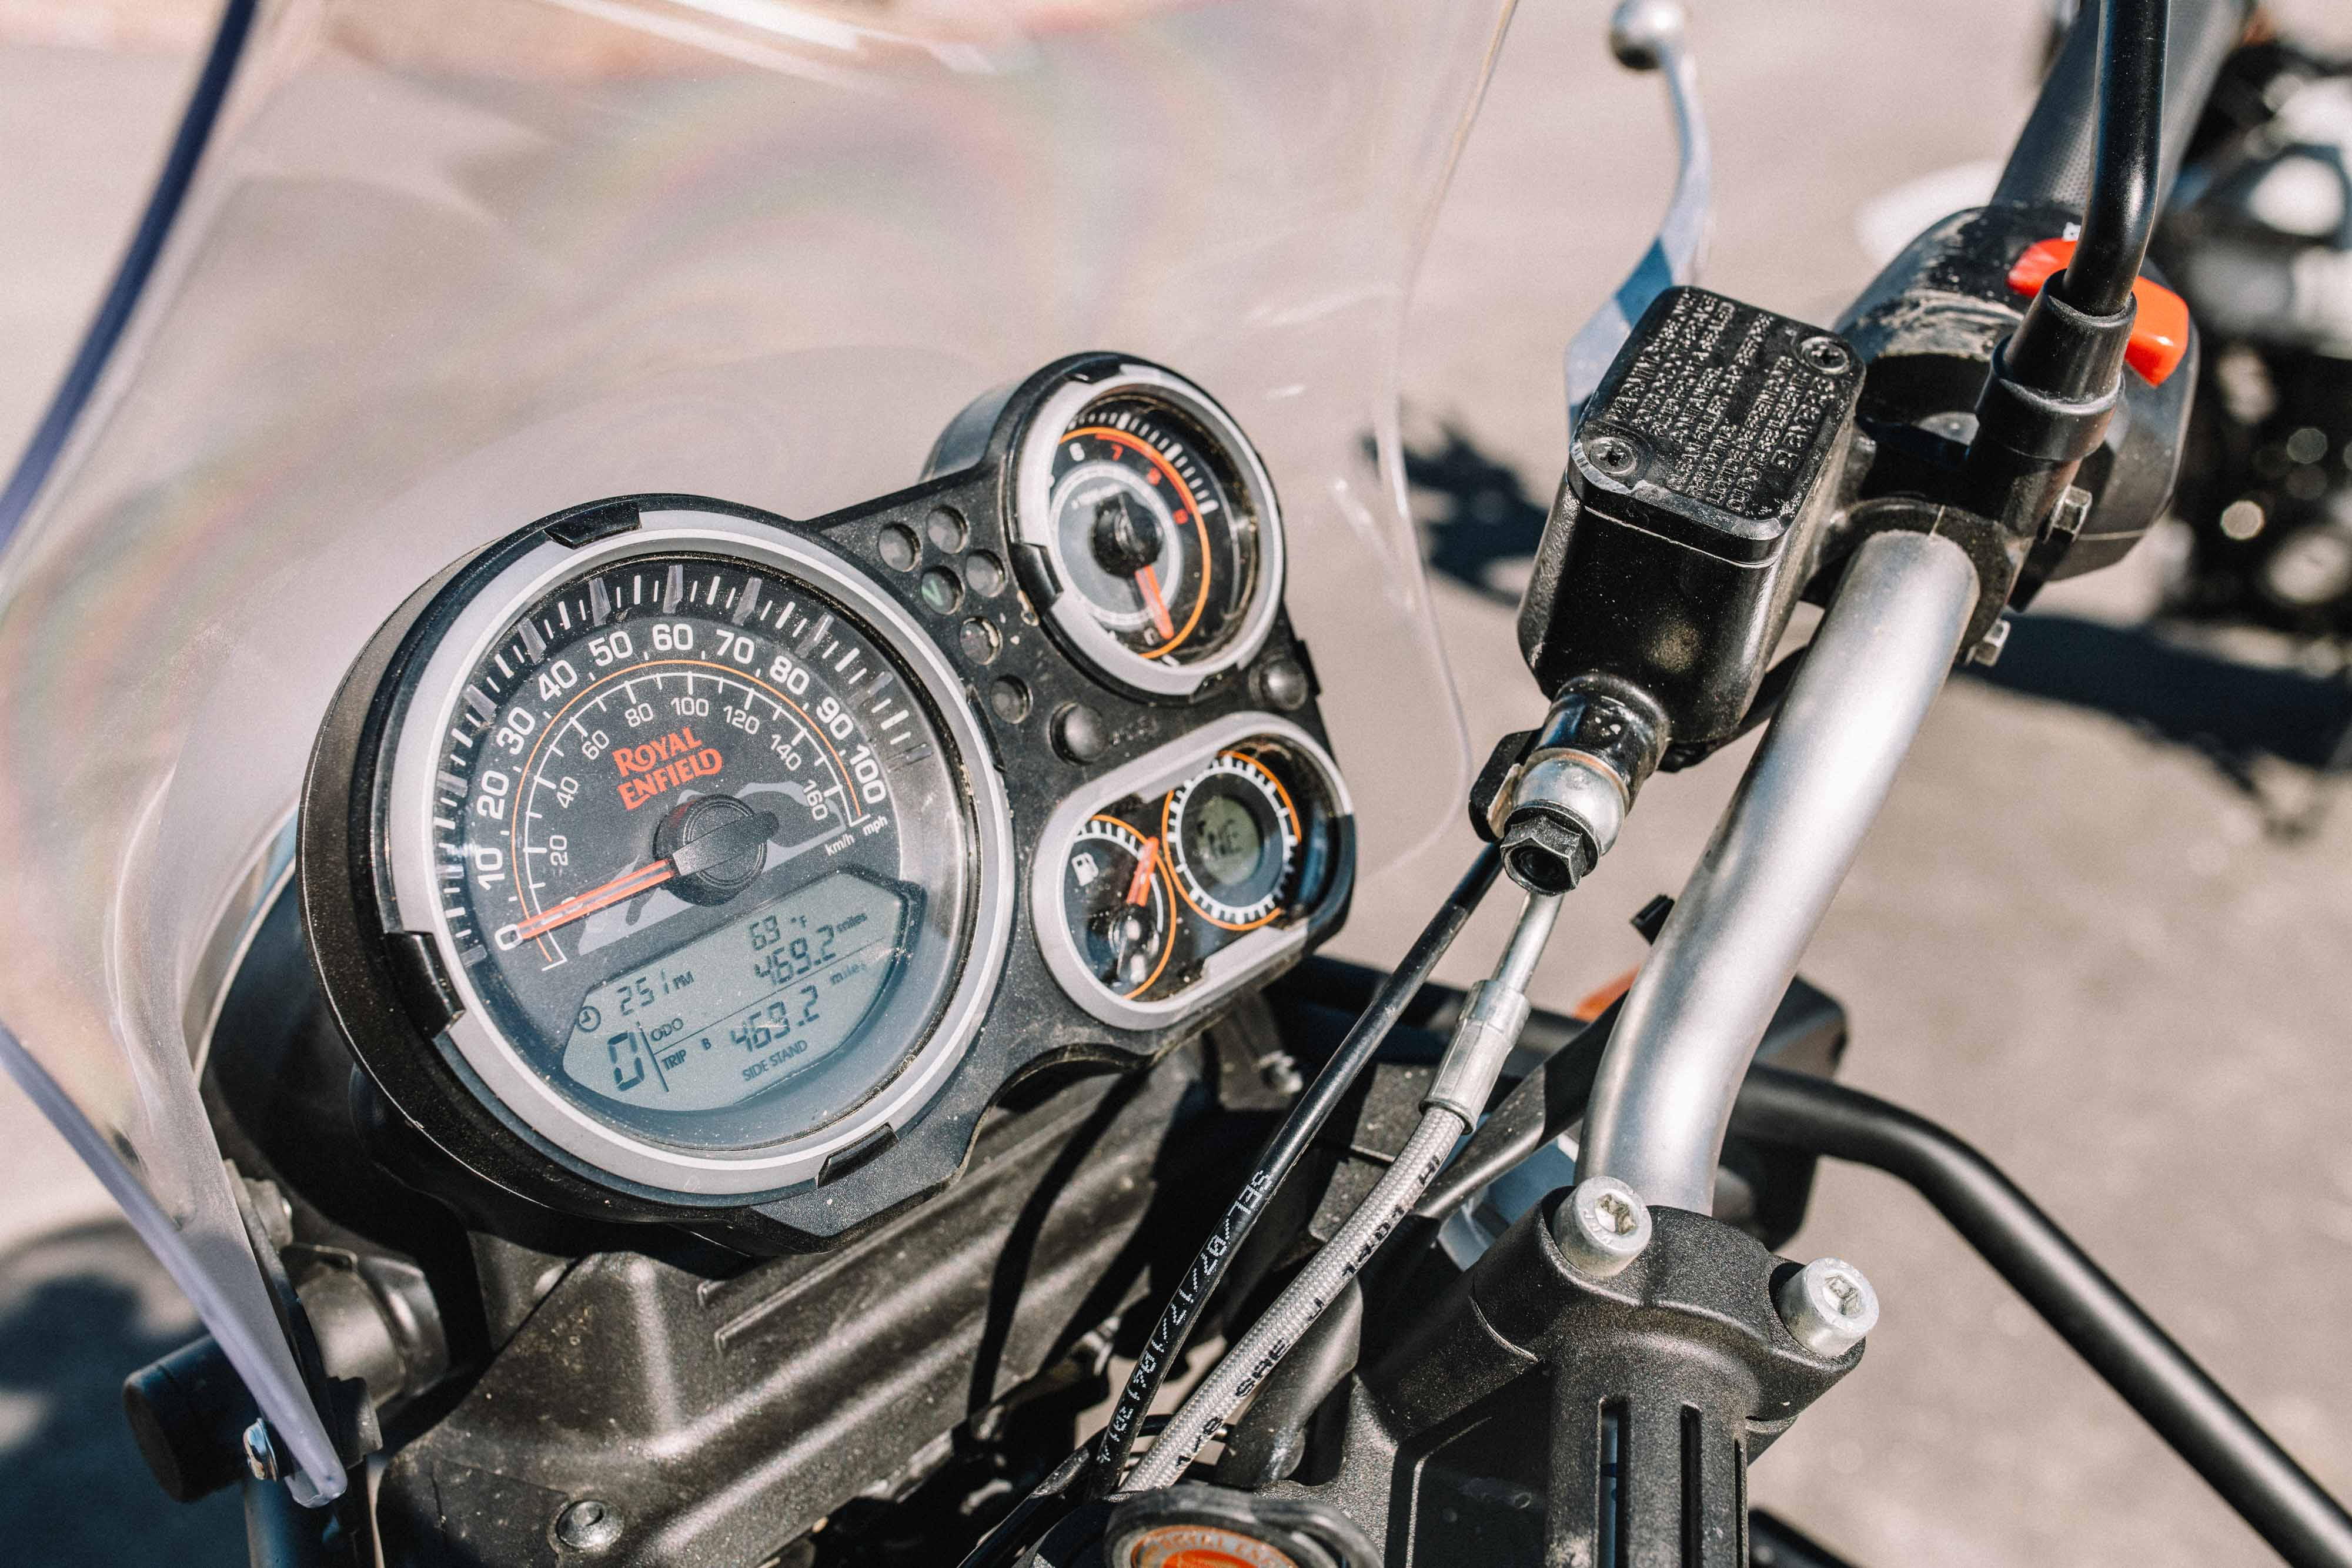 Royal Enfield Himalayan first ride review - RevZilla